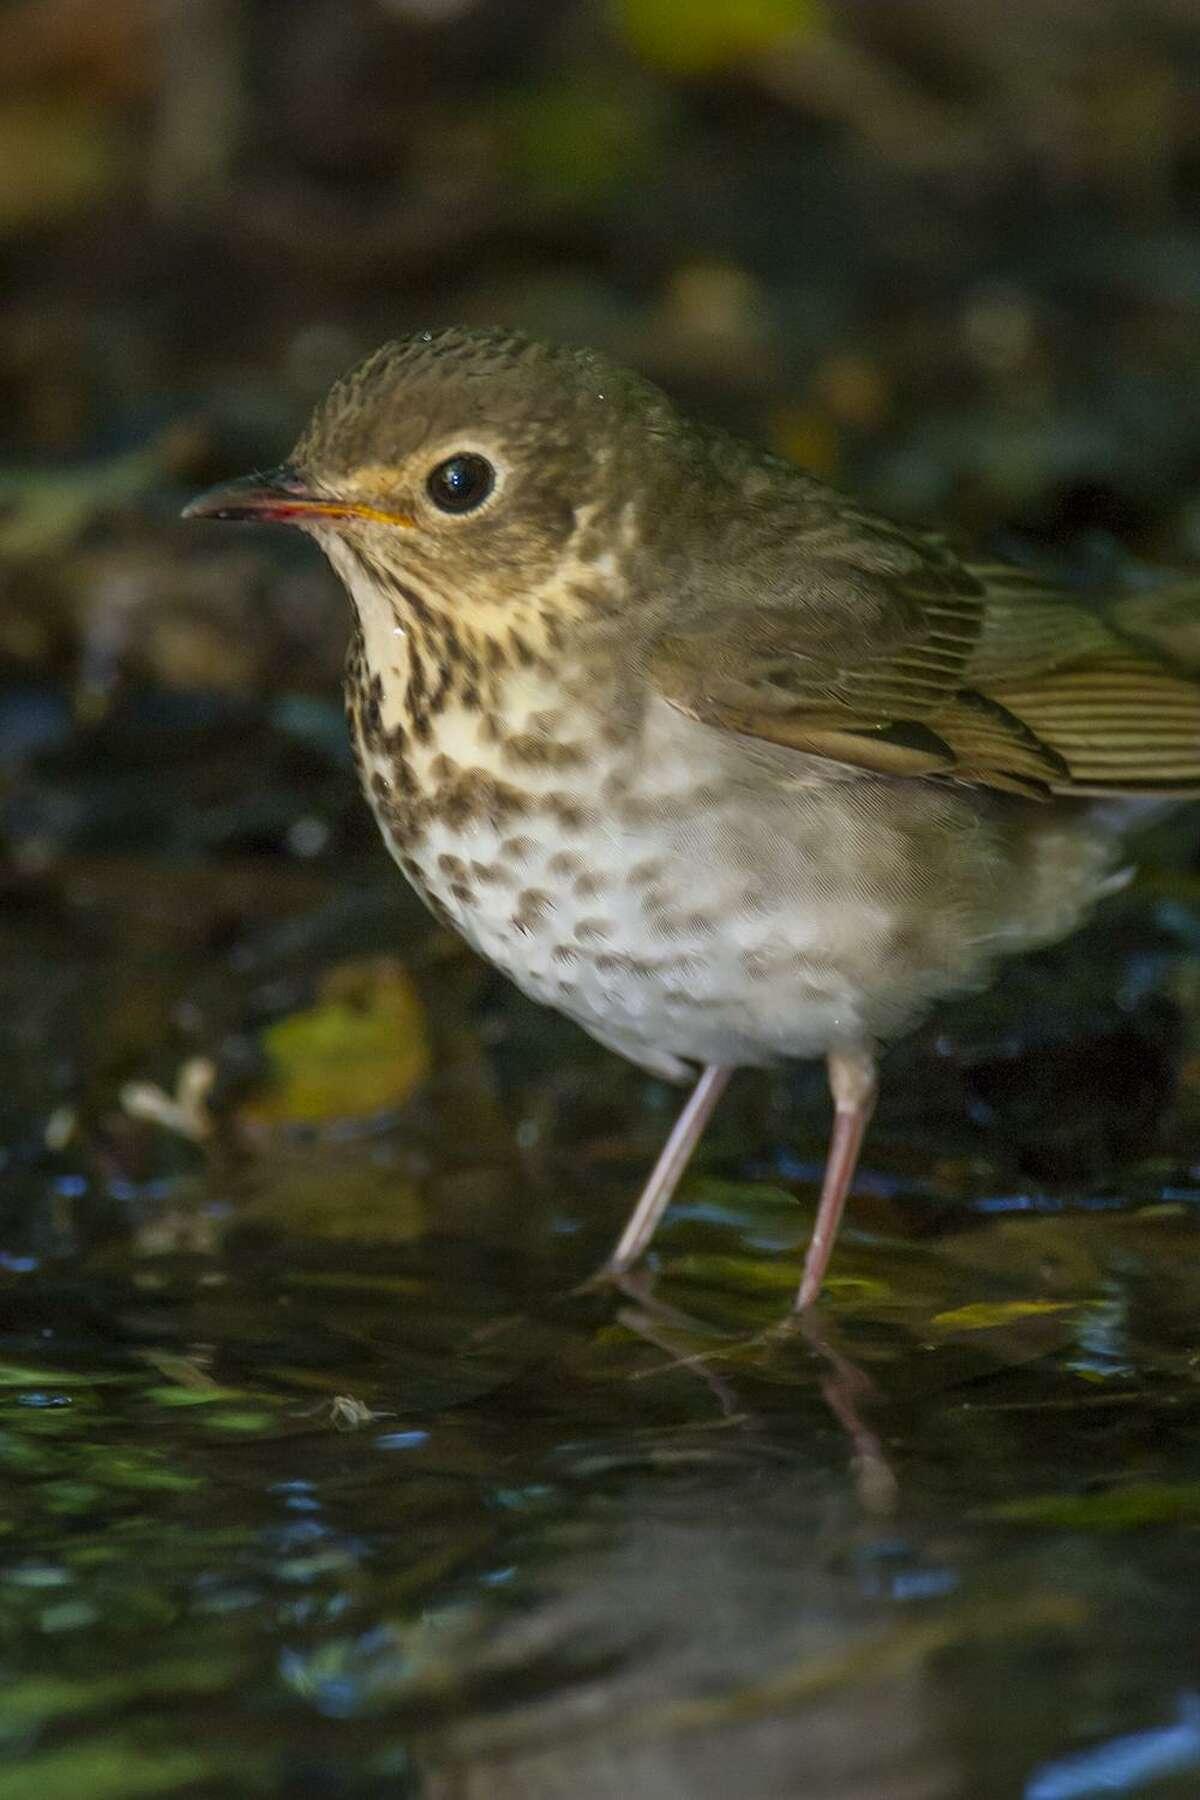 A Swainson's thrush takes a bath at the Houston Audubon Society's High island bird sanctuary.